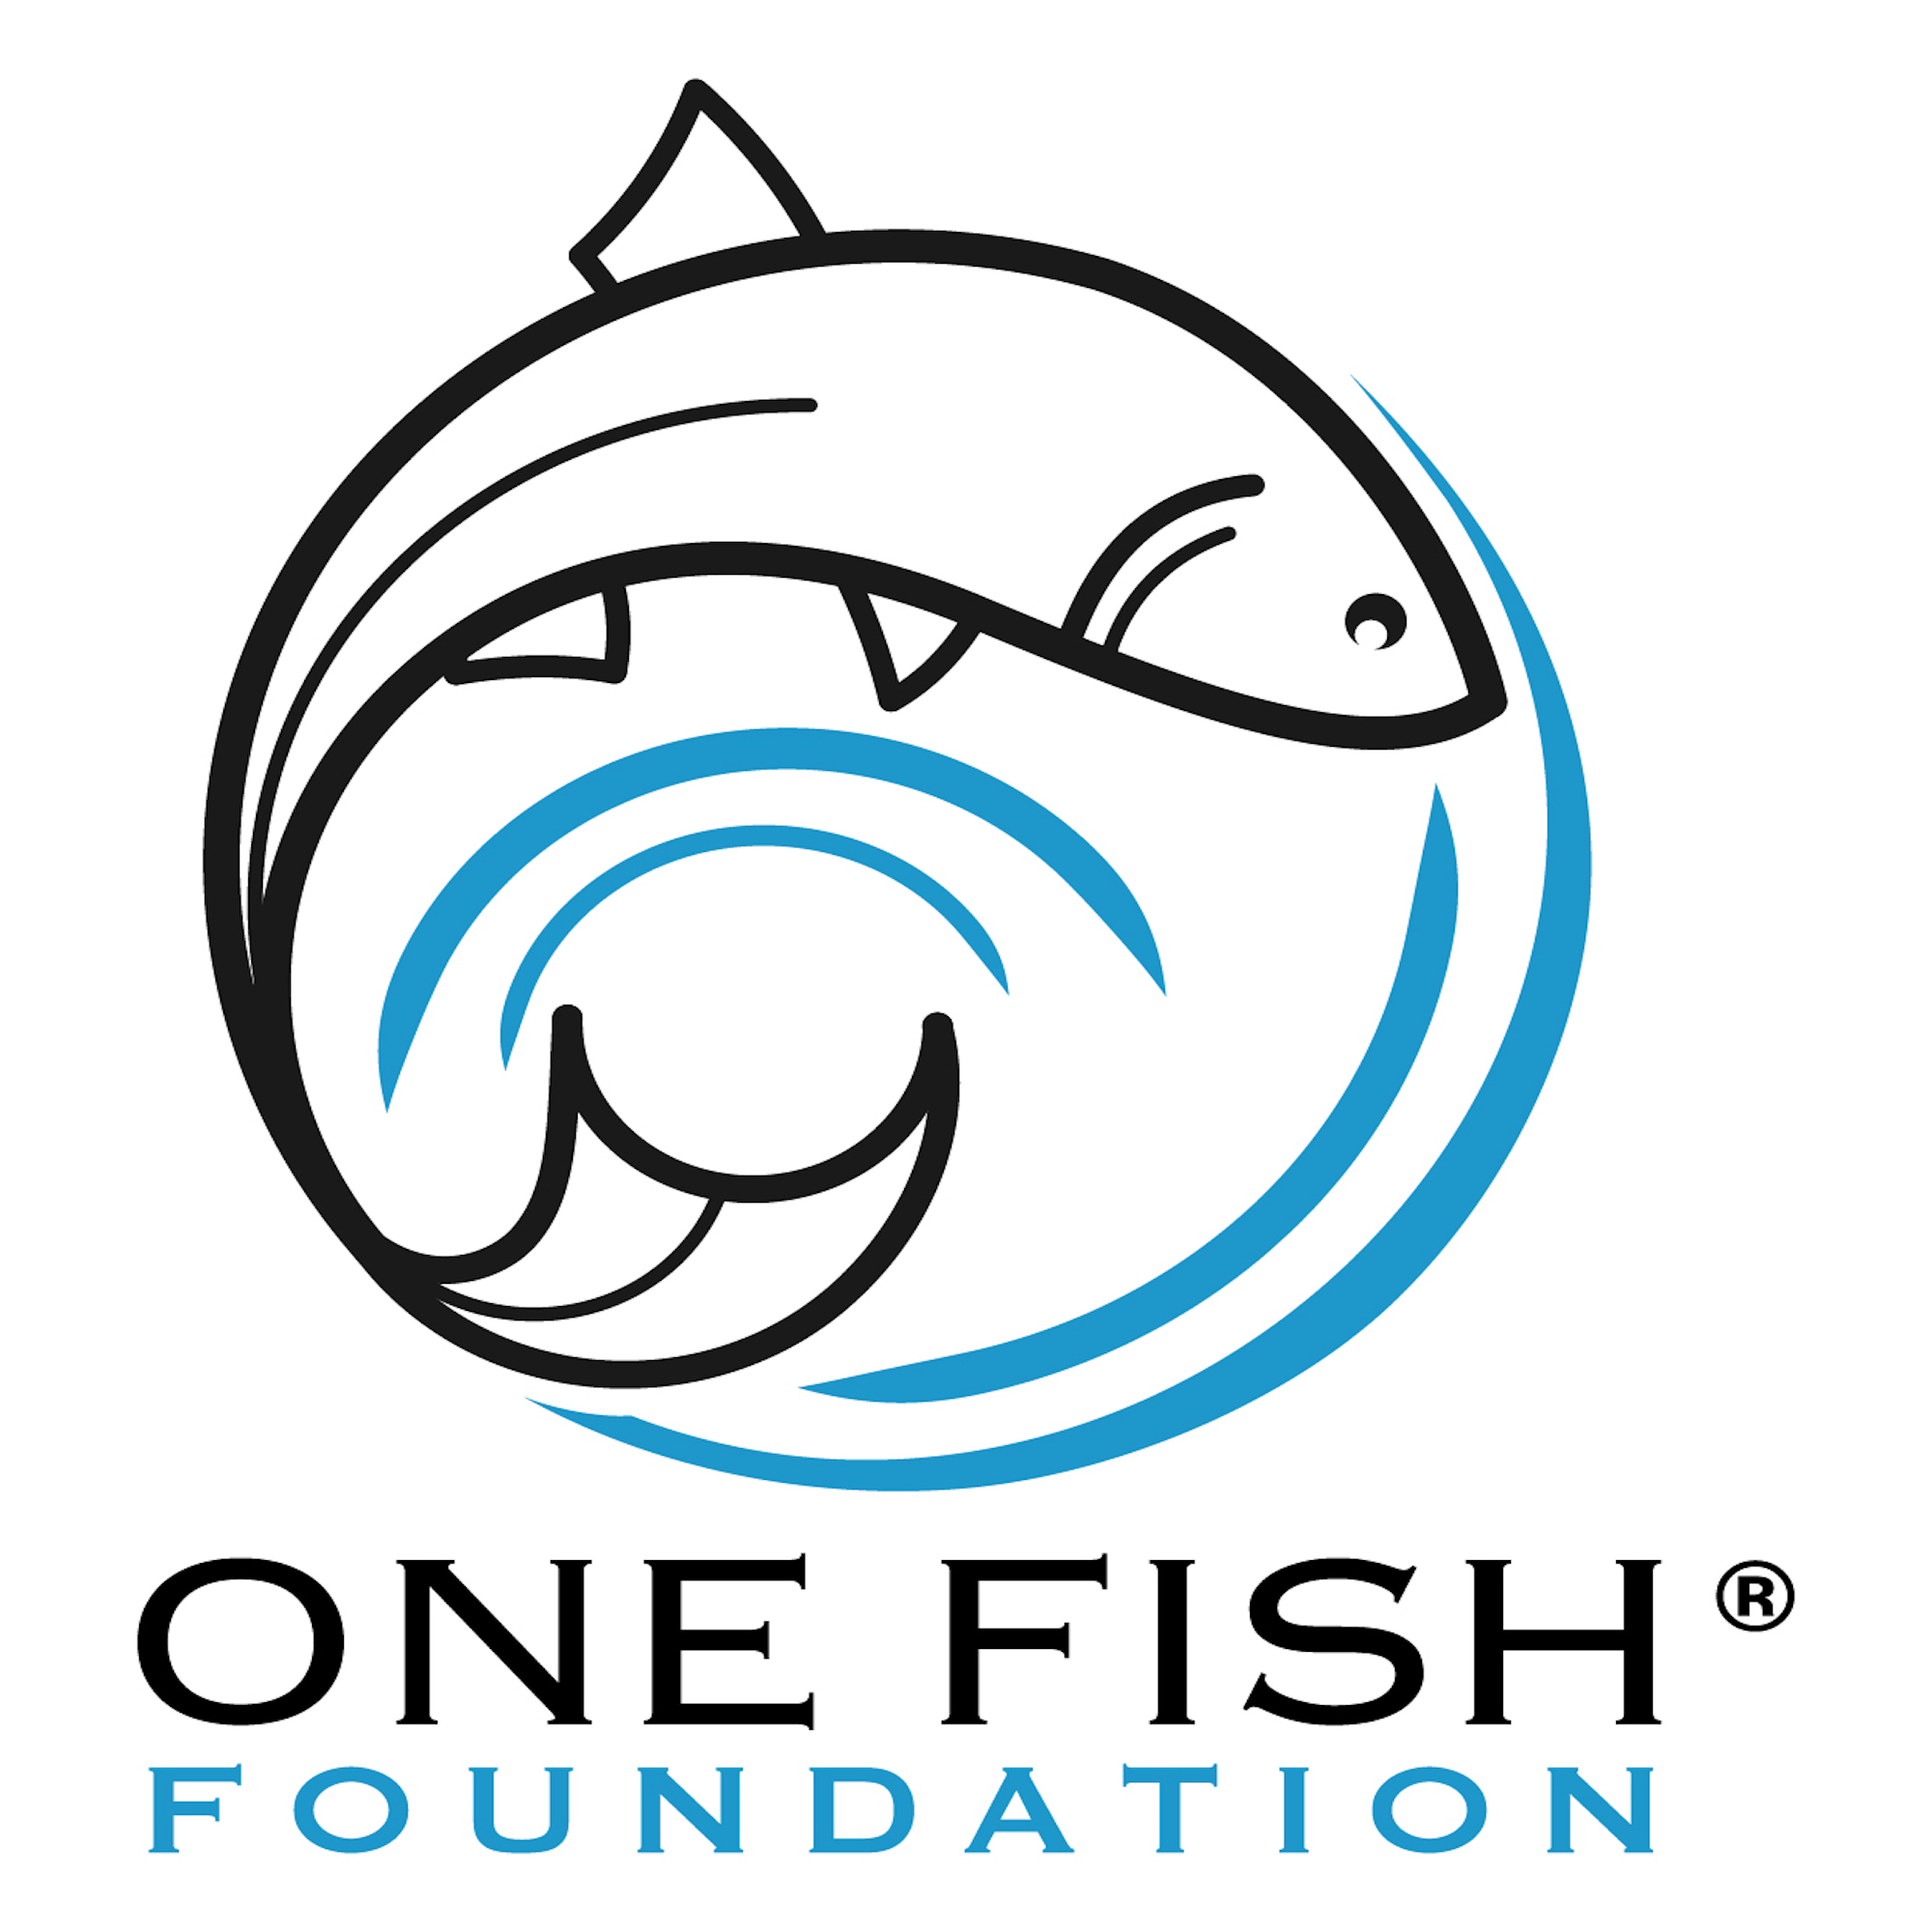 One Fish Foundation